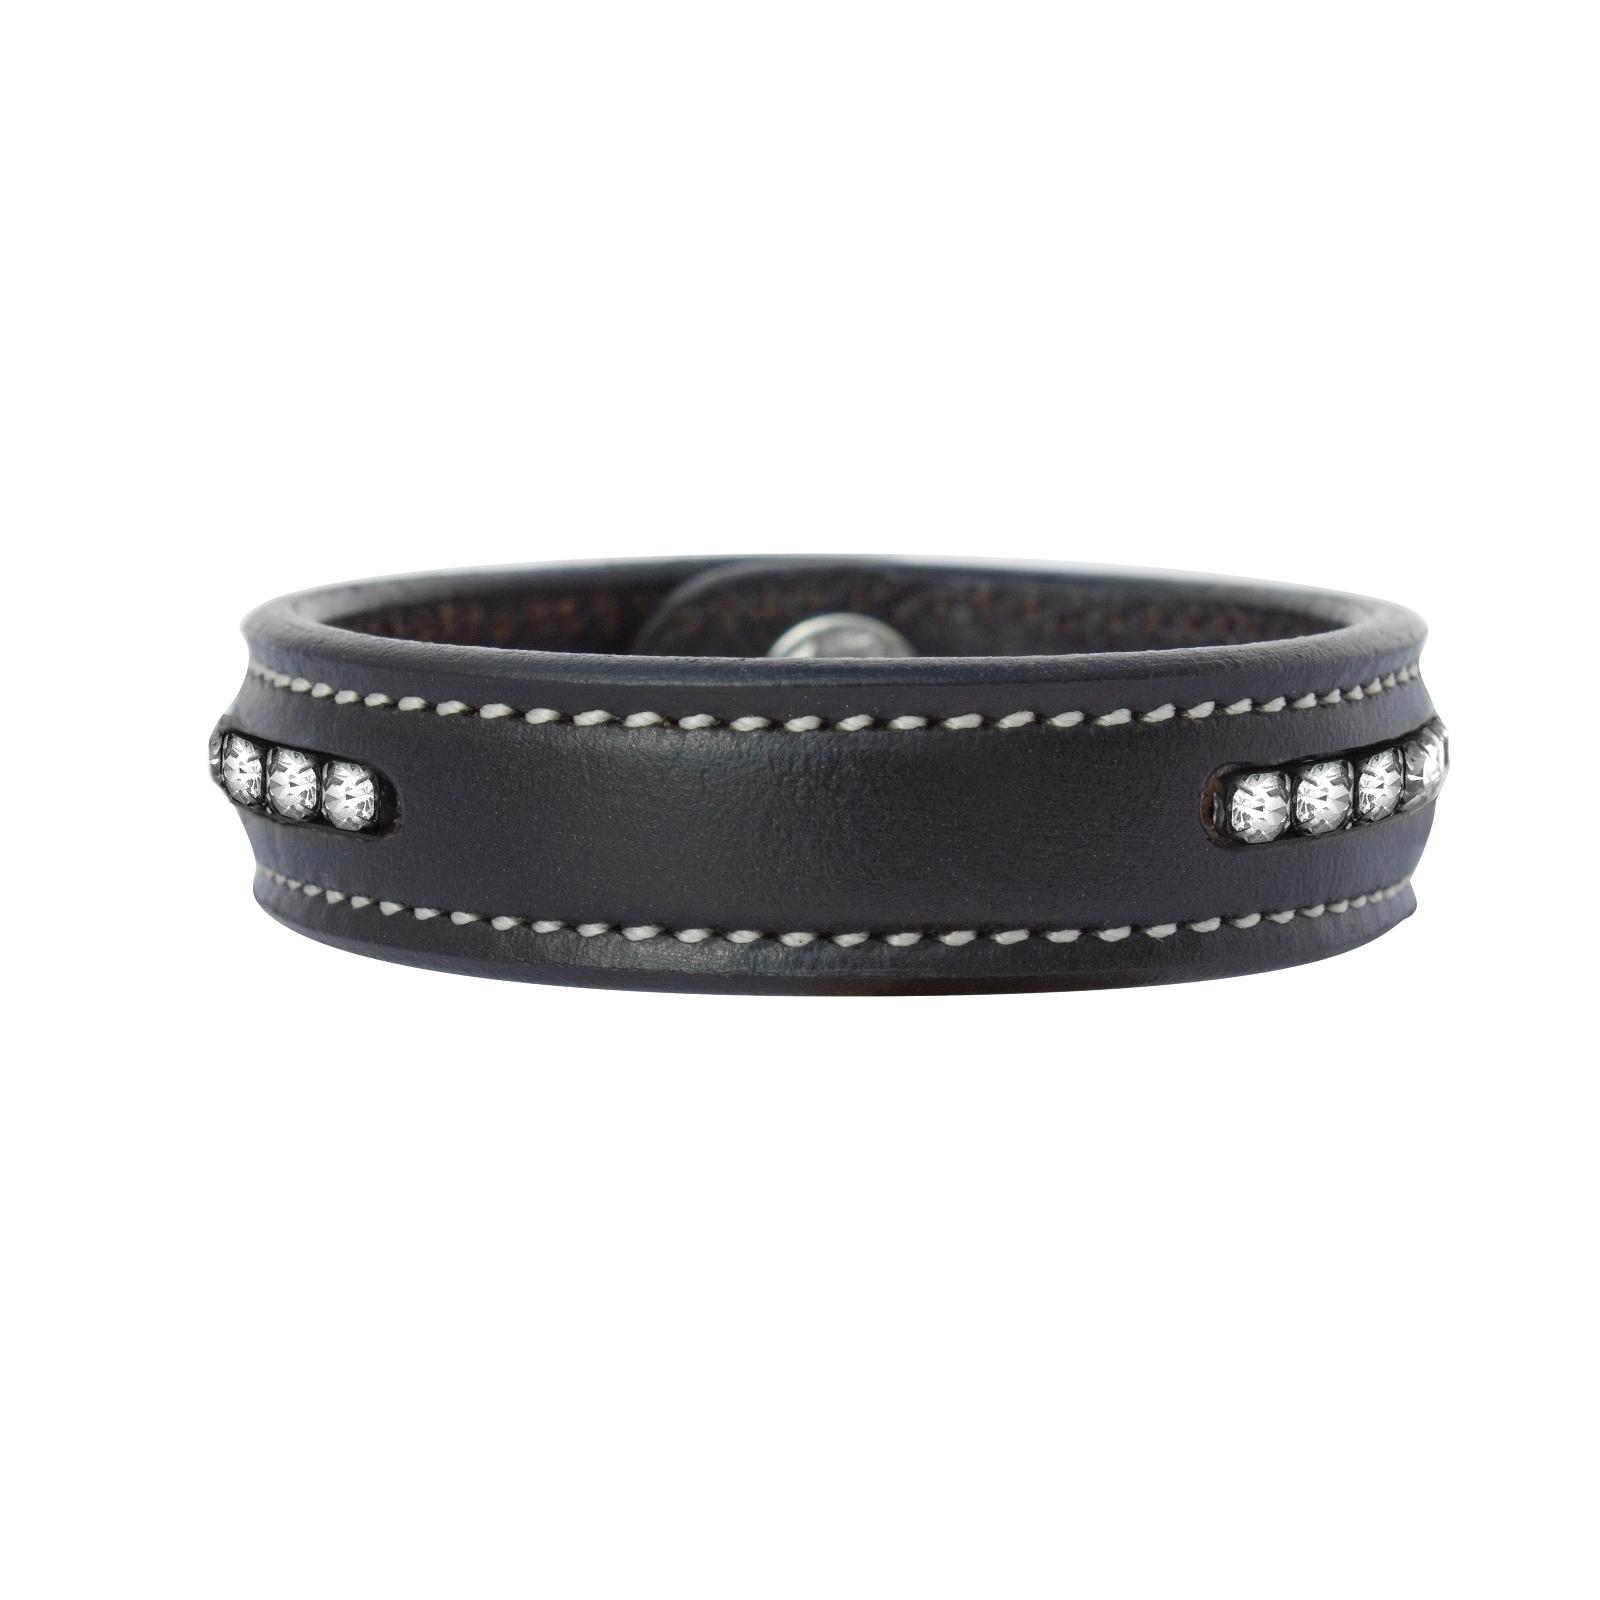 Perri's Crystal Leather Bracelet